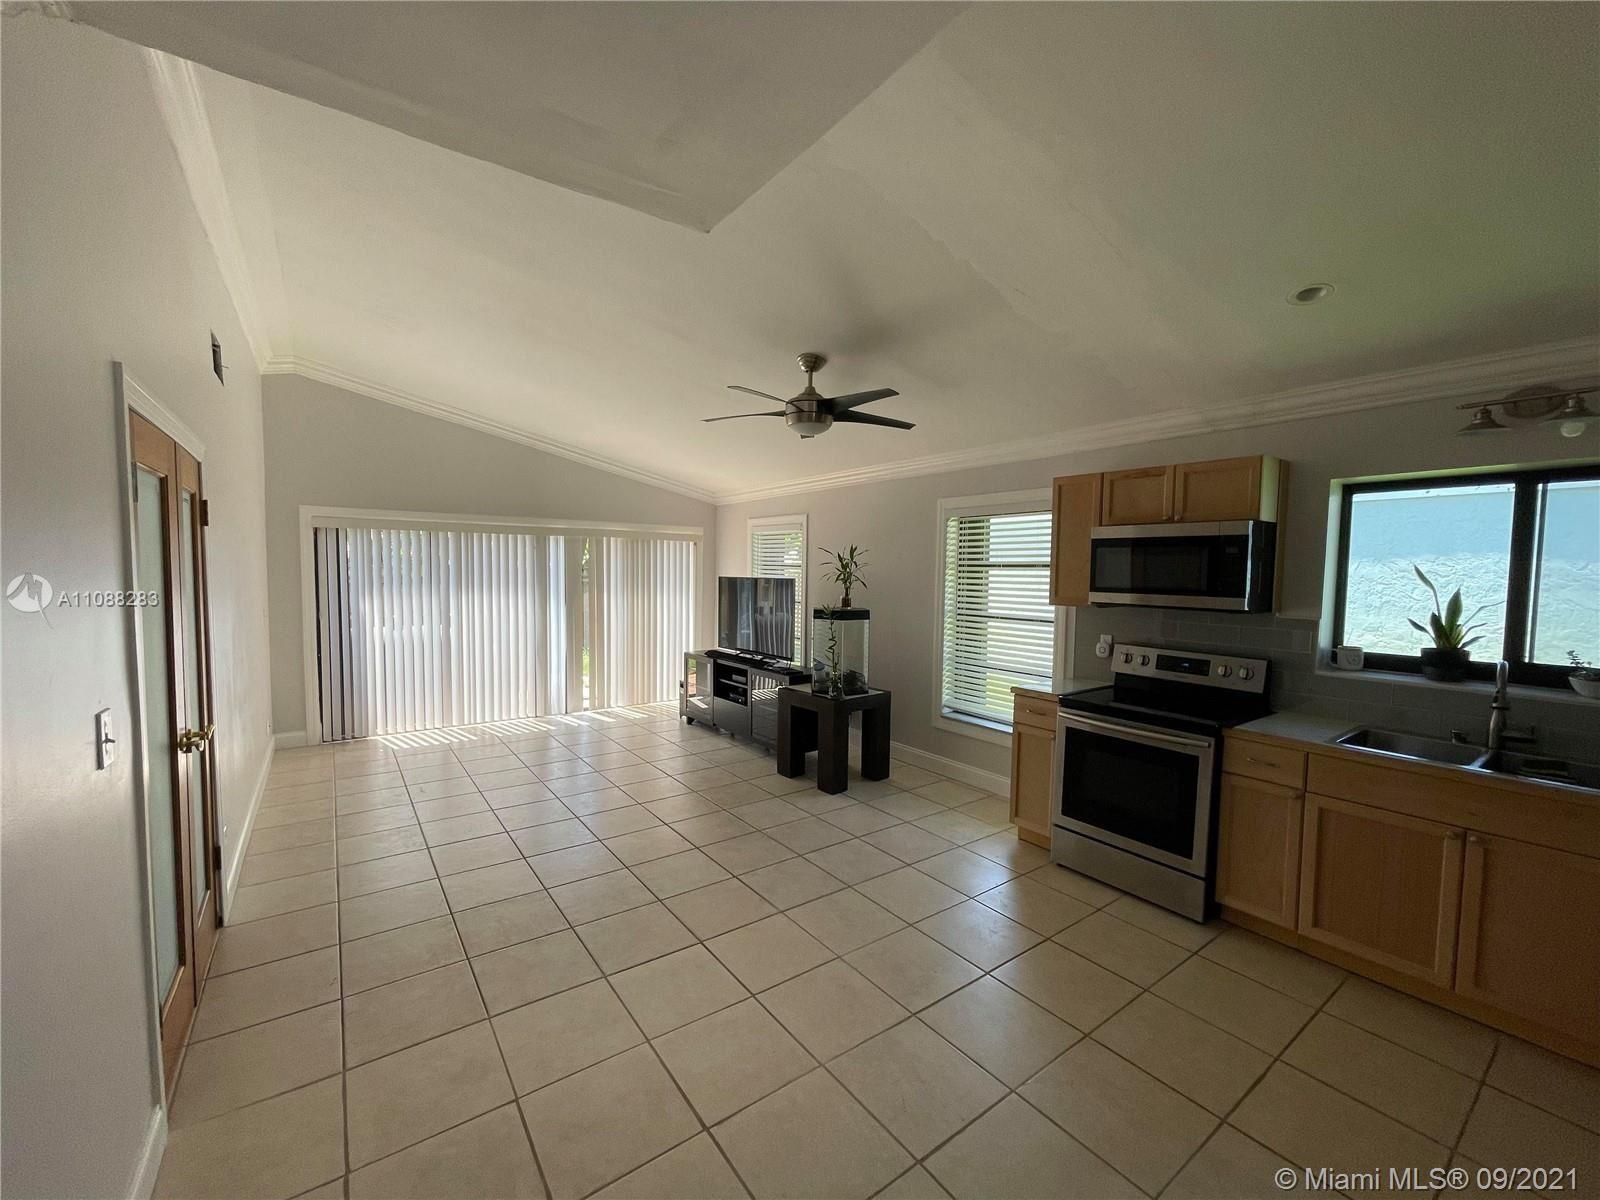 Photo of 9816 SW 57th St, Cooper City, FL 33328 (MLS # A11088283)